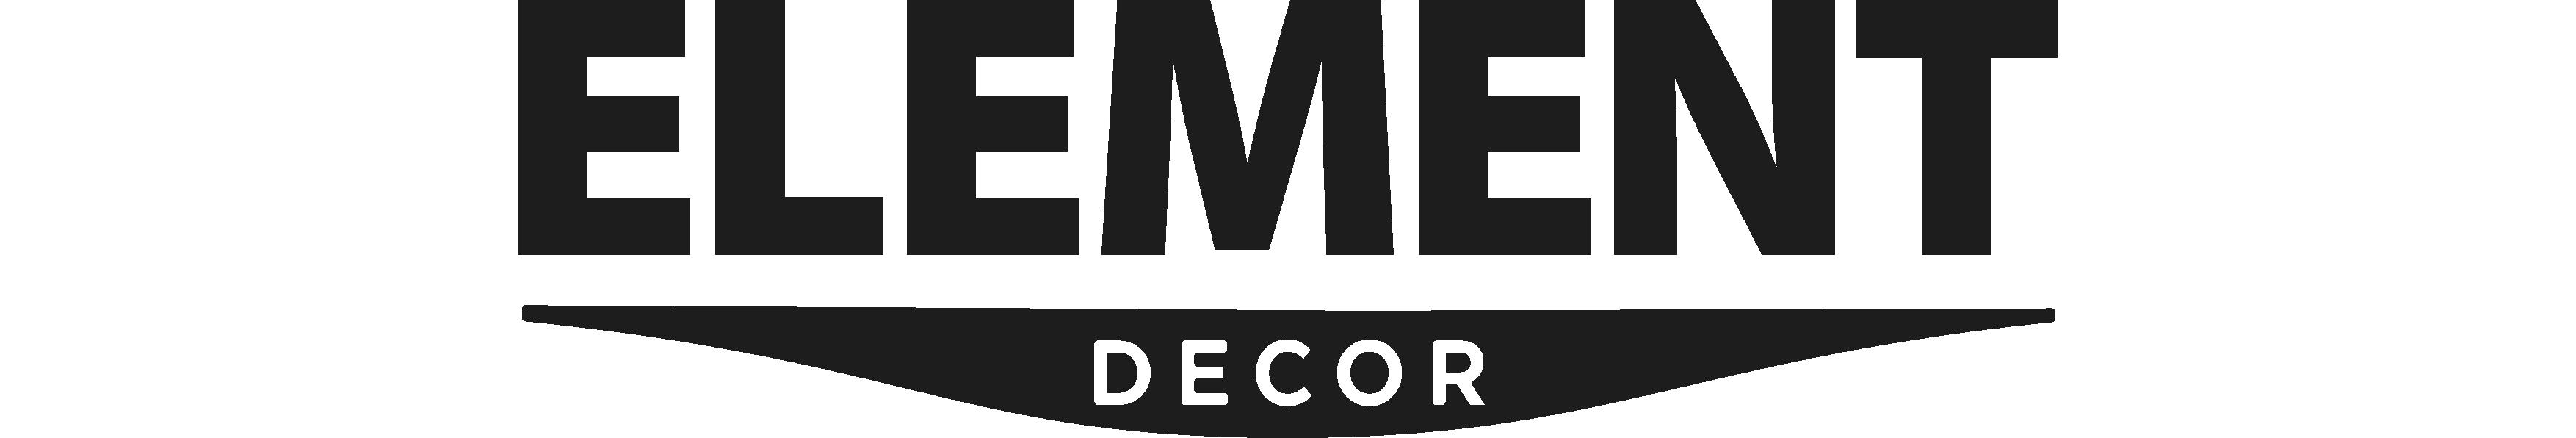 Element Decor